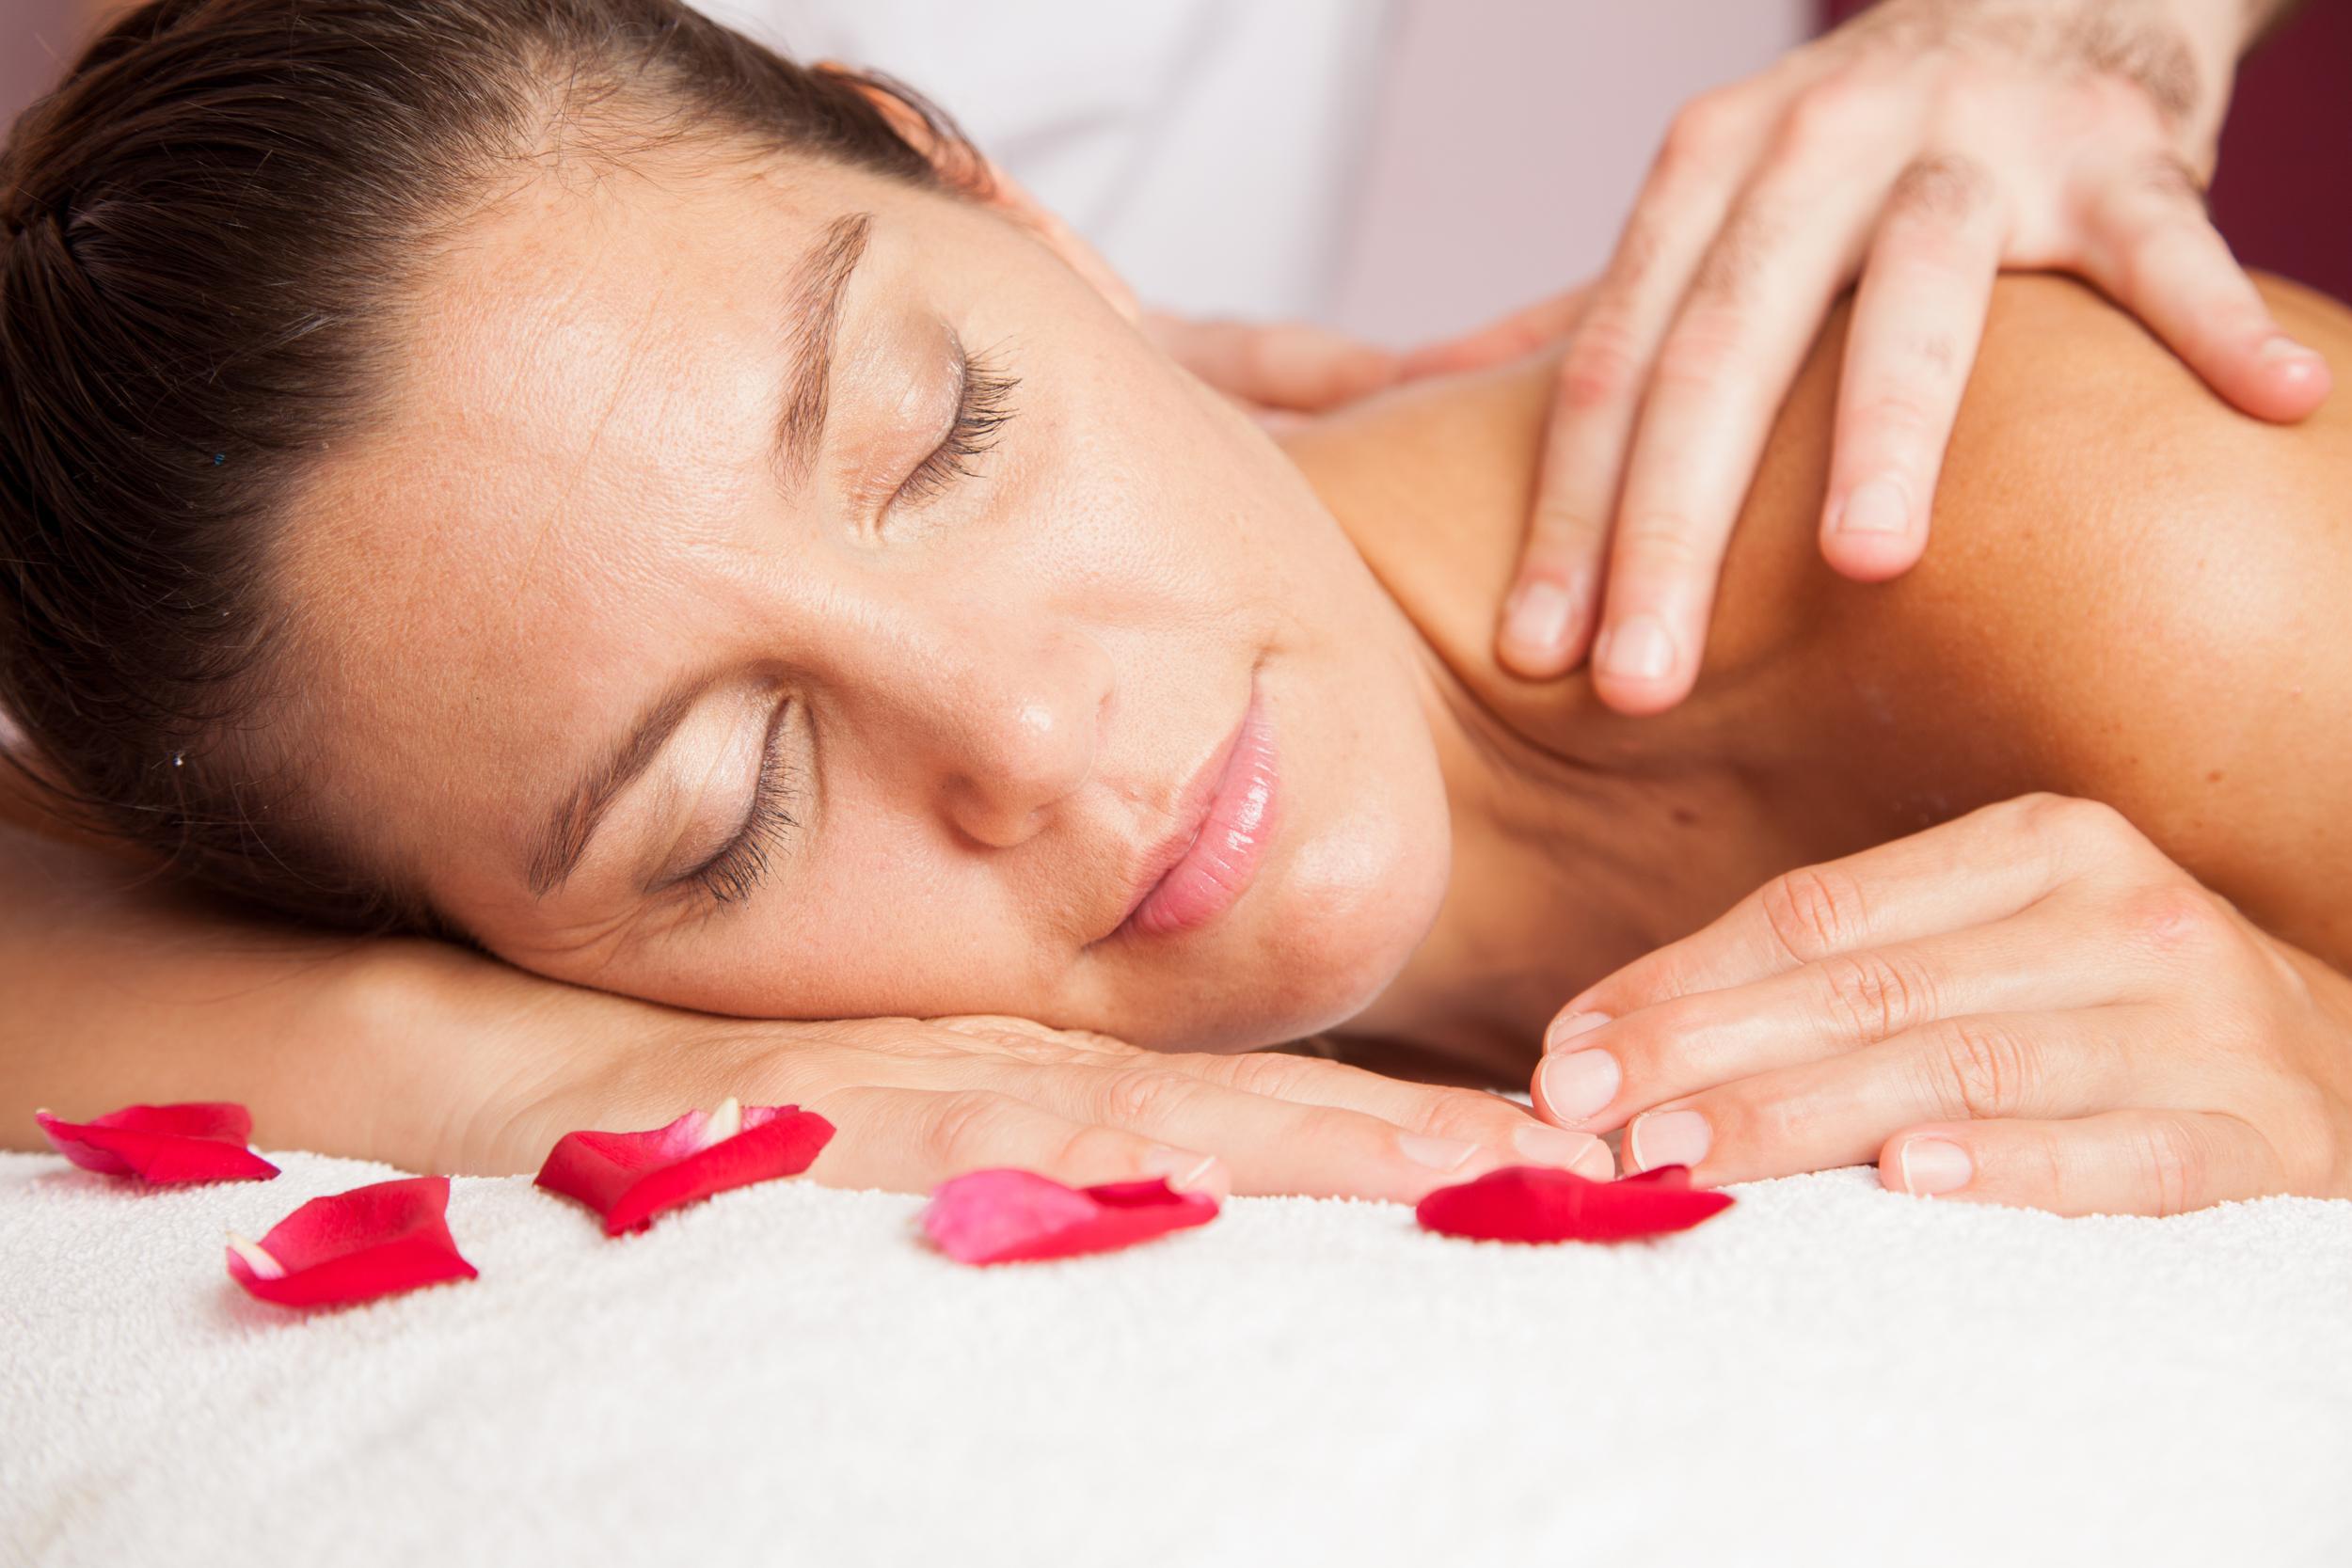 woman-receibing-a-massage-at-the-spa_rwuxG2hv2Me.jpg